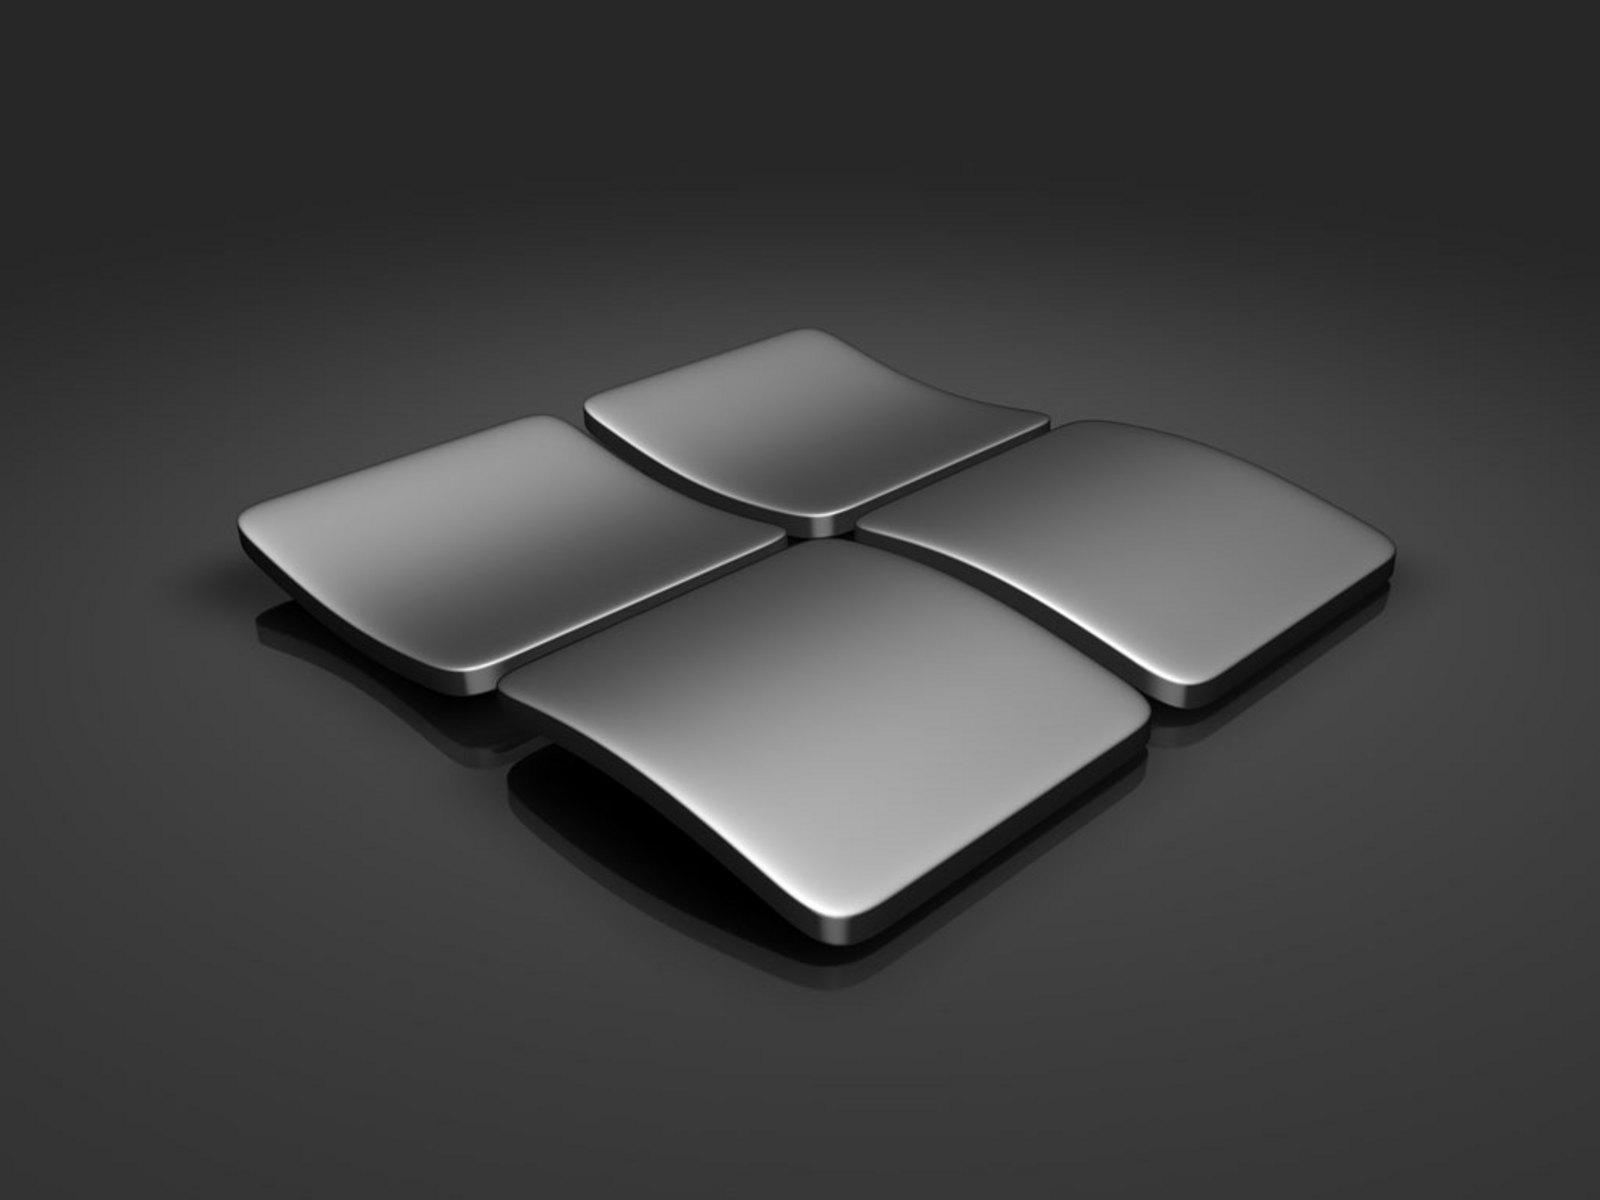 Dark Windows Wallpapers HD Wallpapers 1600x1200